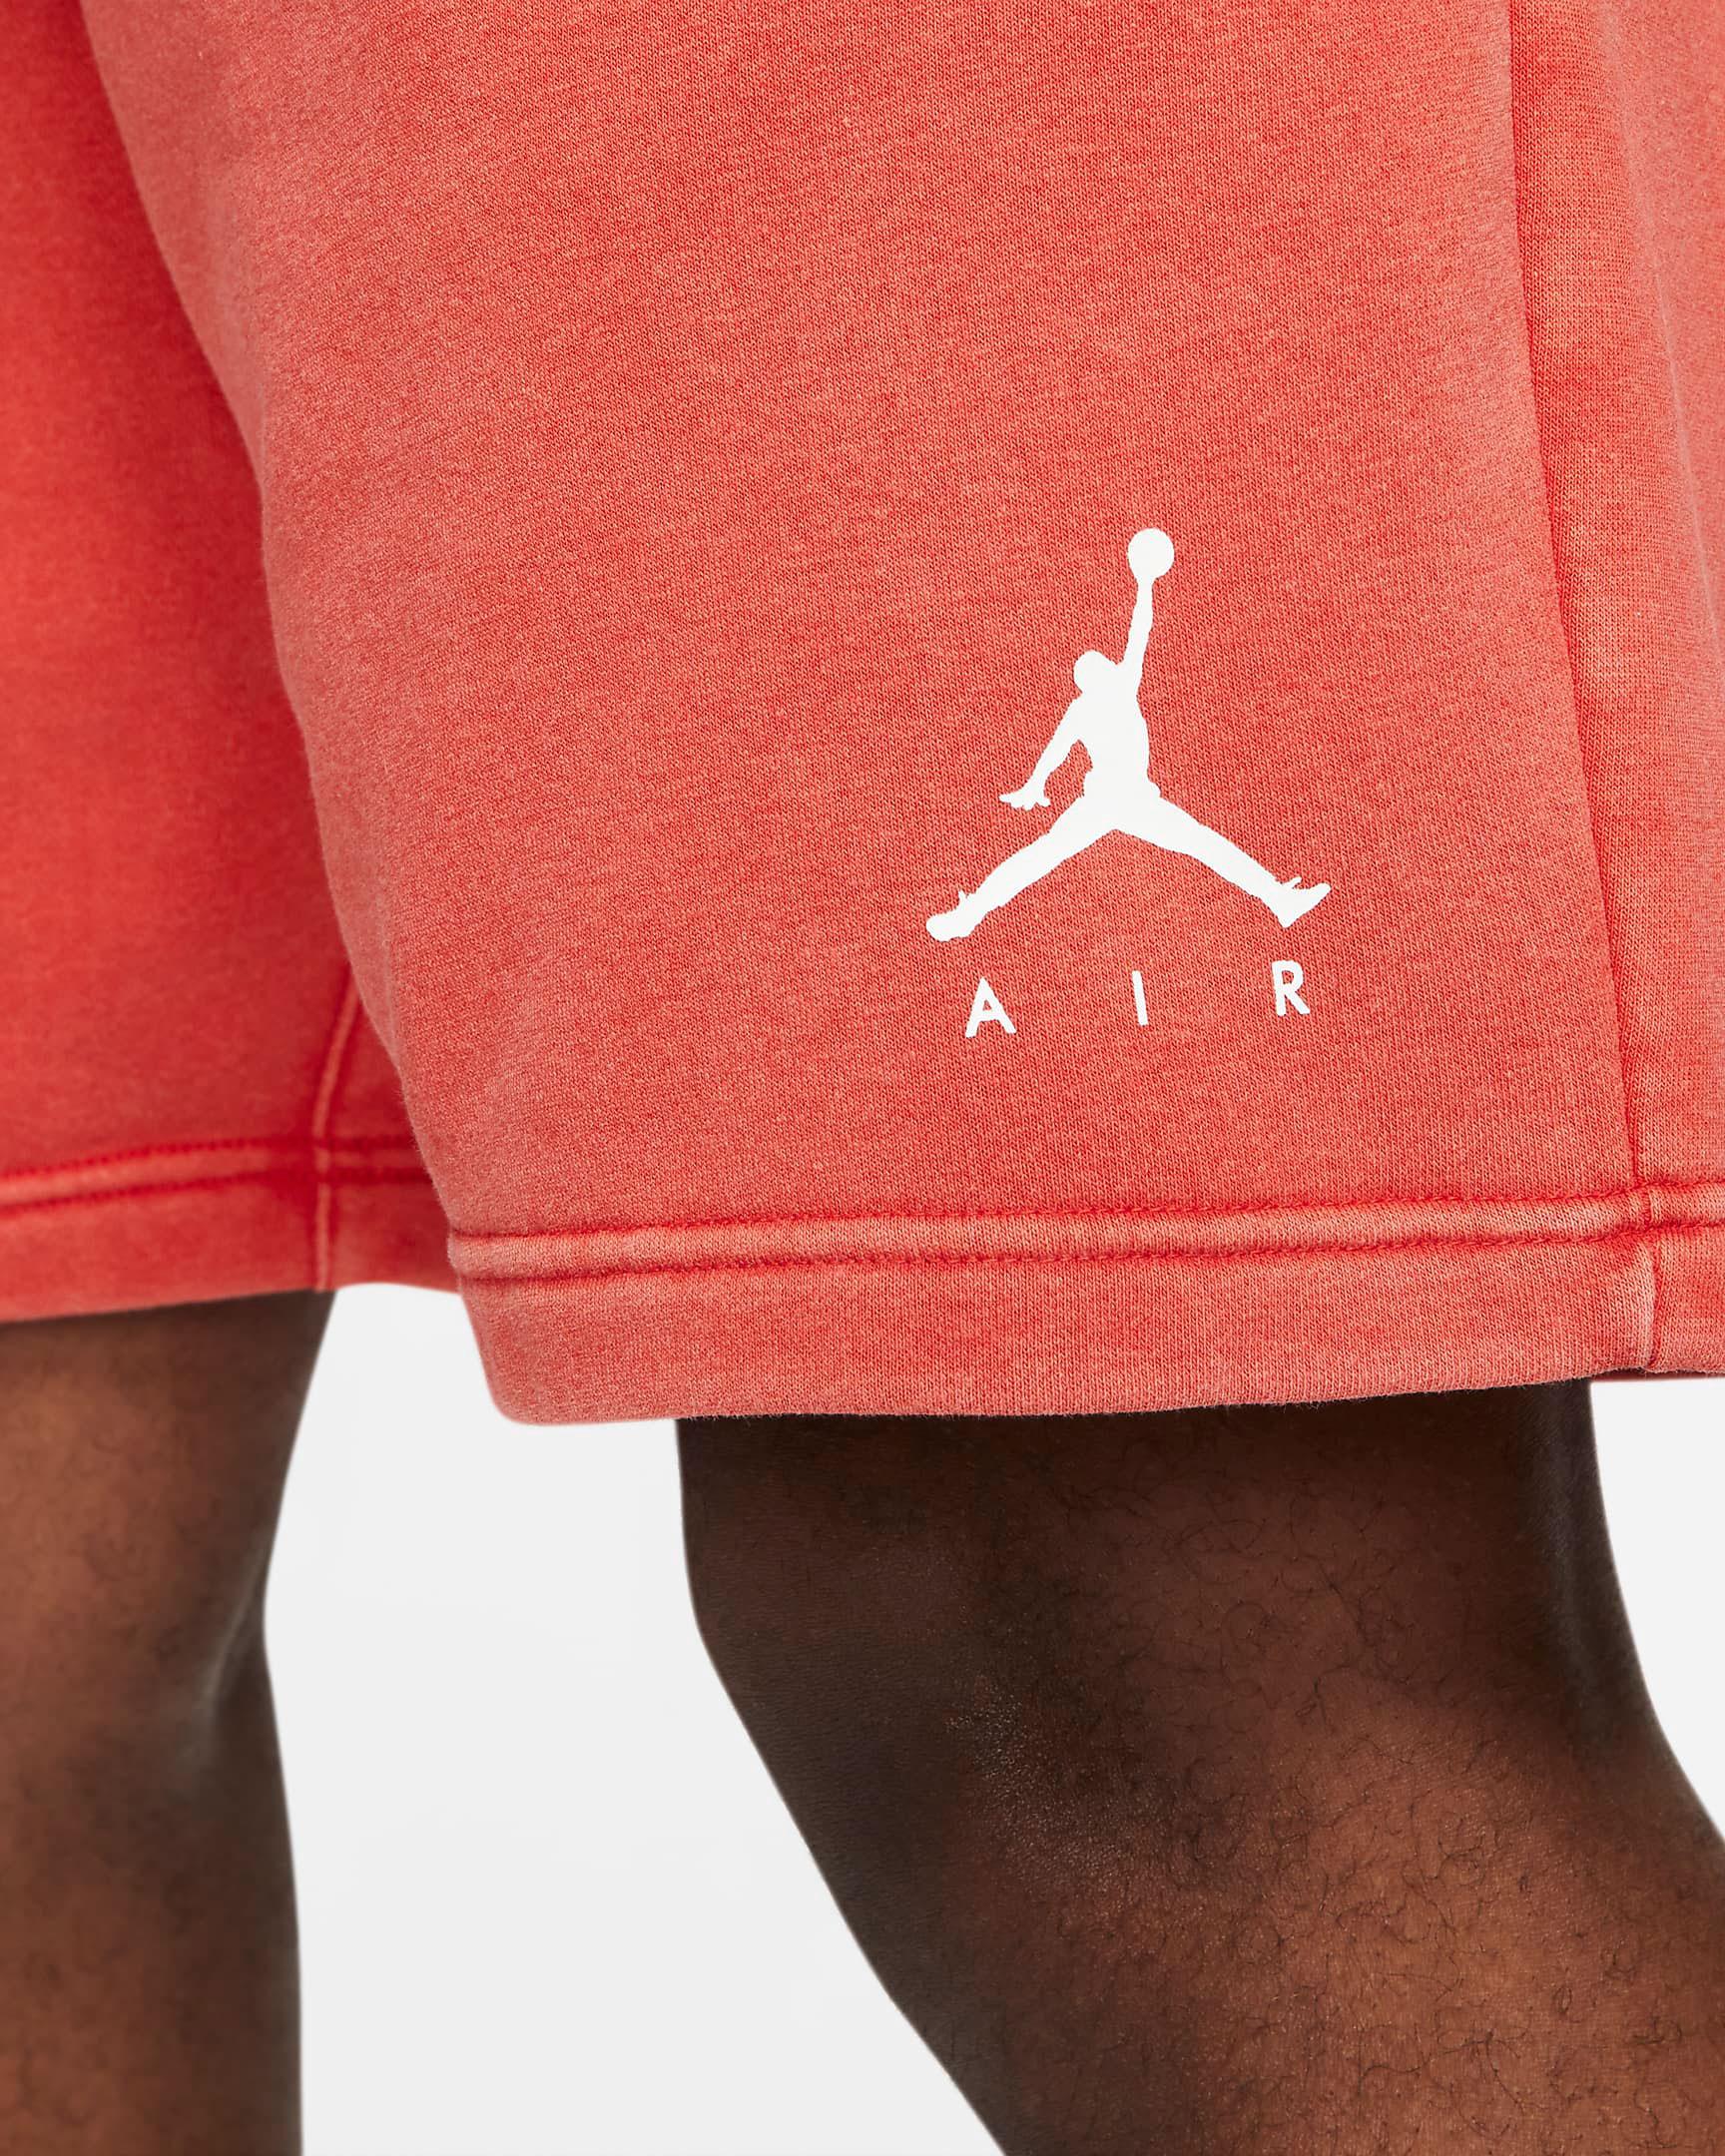 jordan-4-taupe-haze-infrared-shorts-2